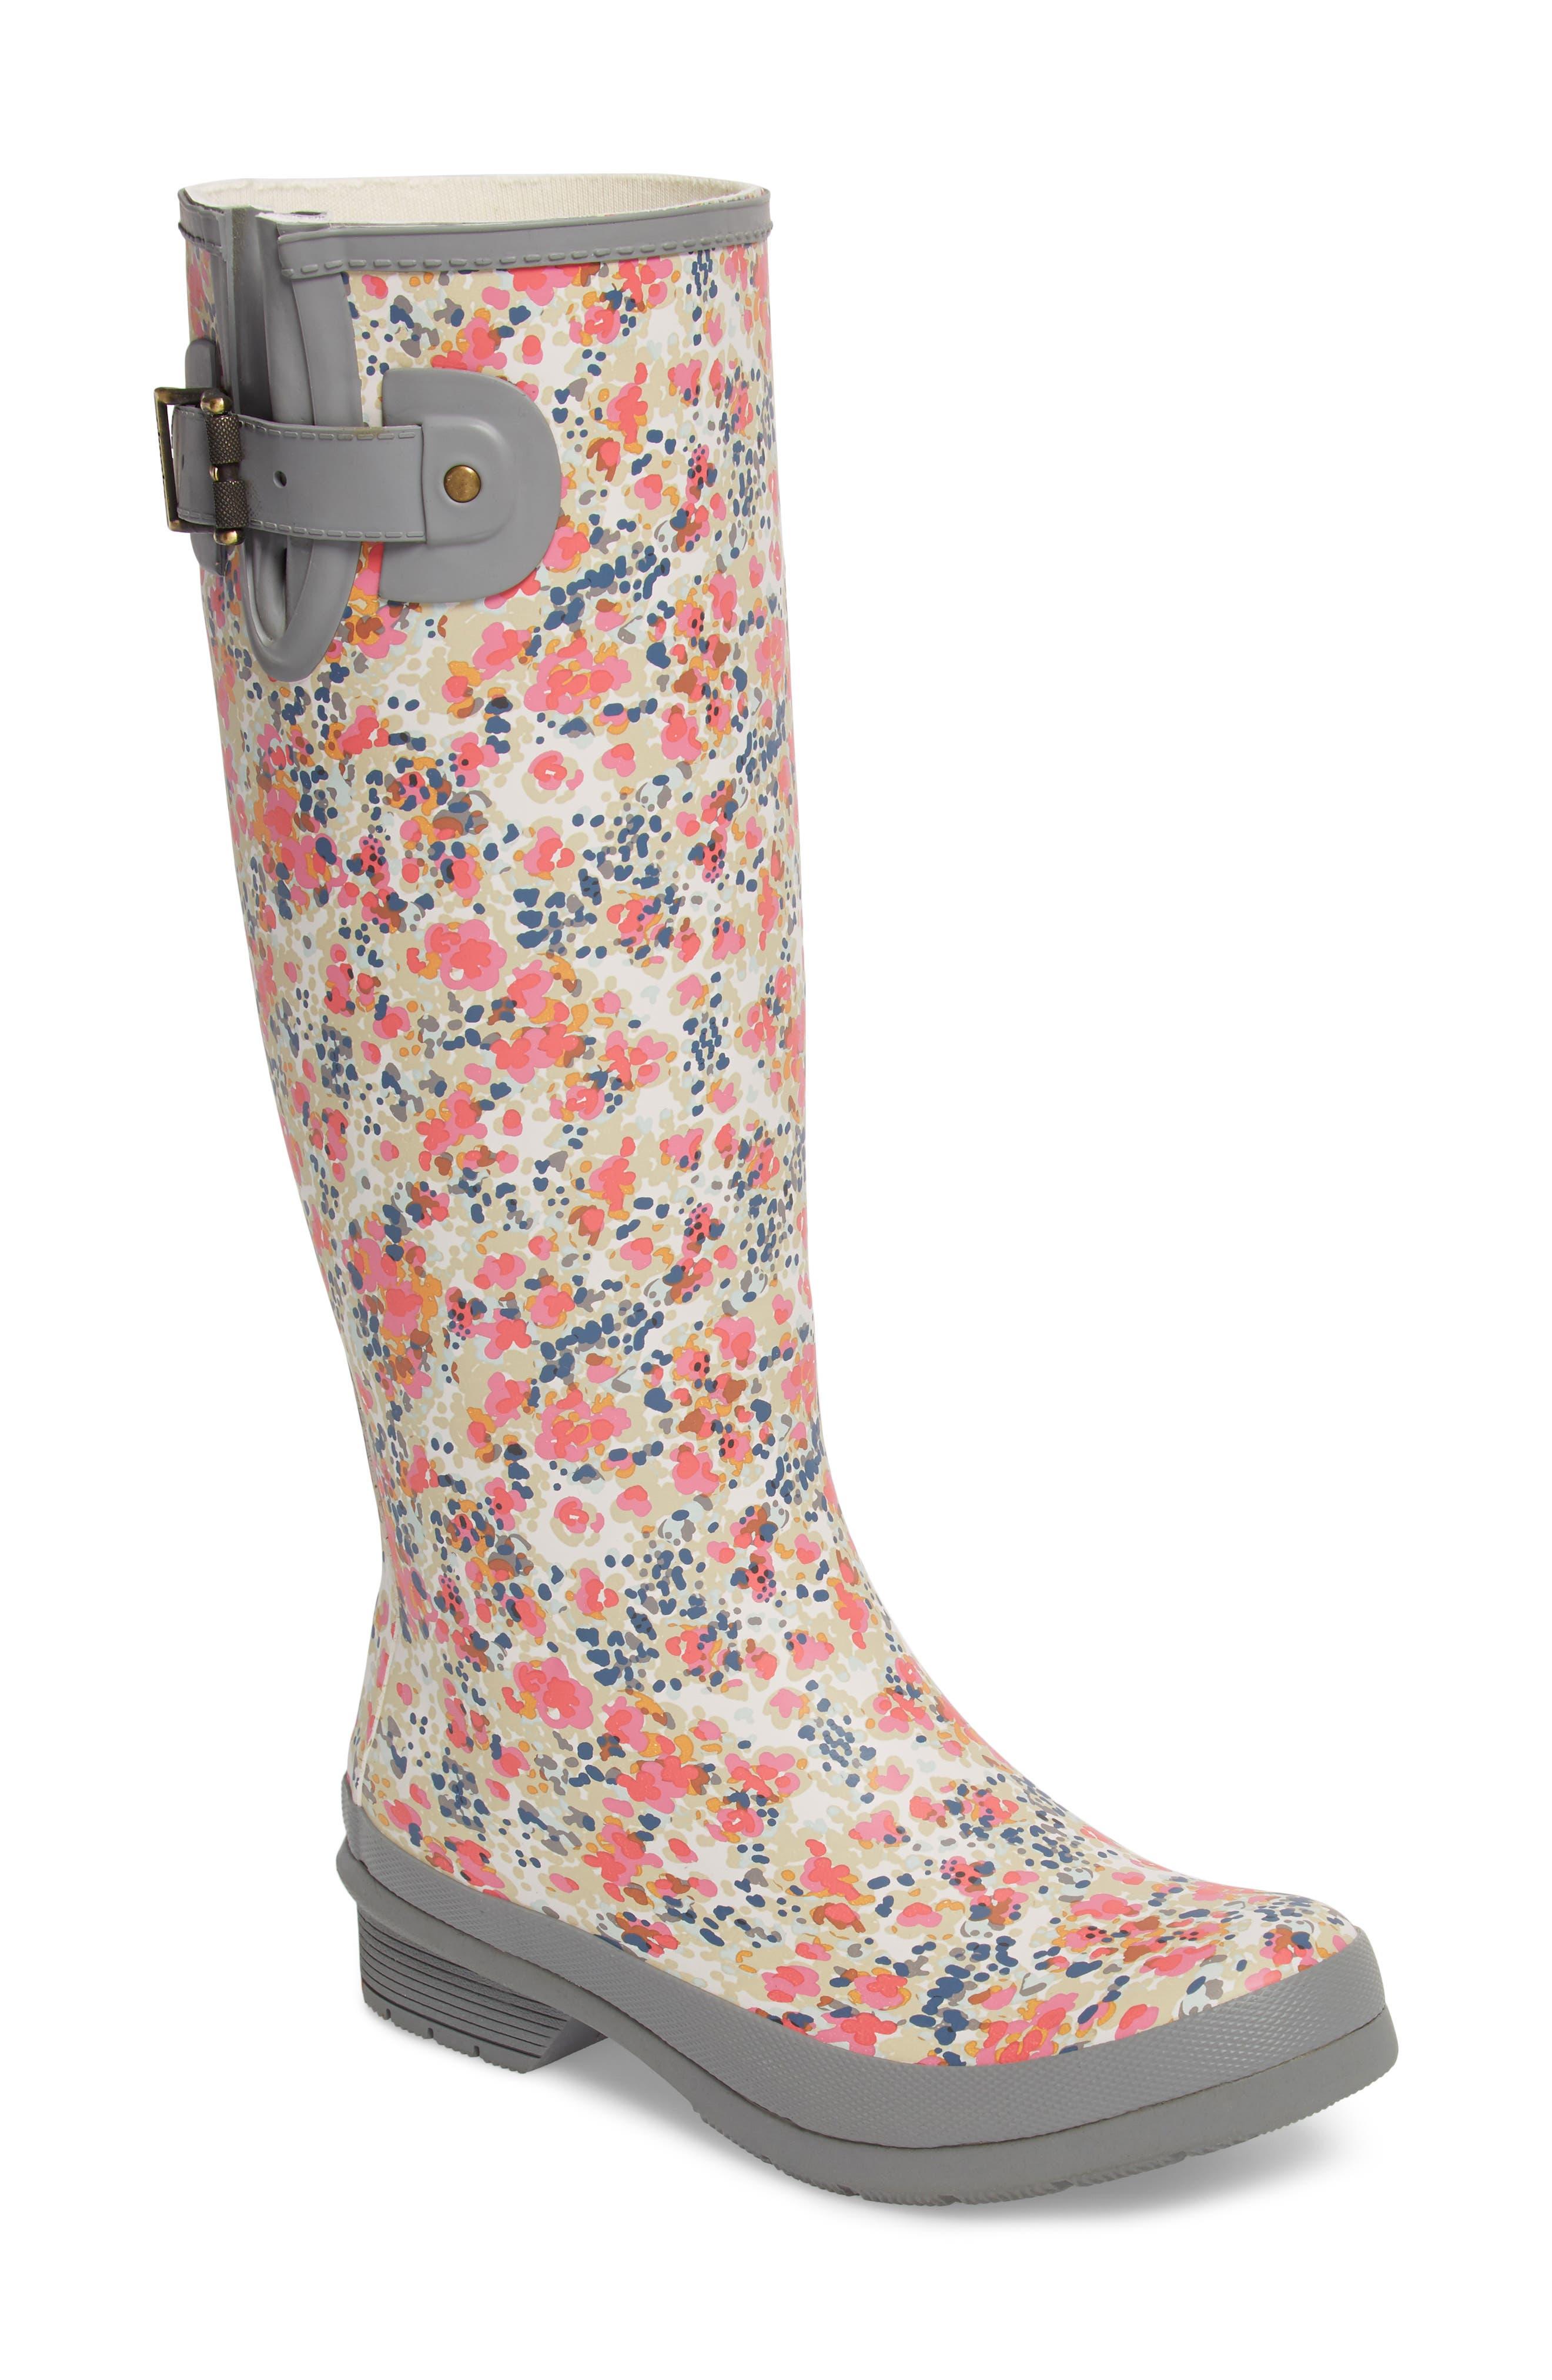 CHOOKA Julia Floral Waterproof Rain Boot, Main, color, GRAY